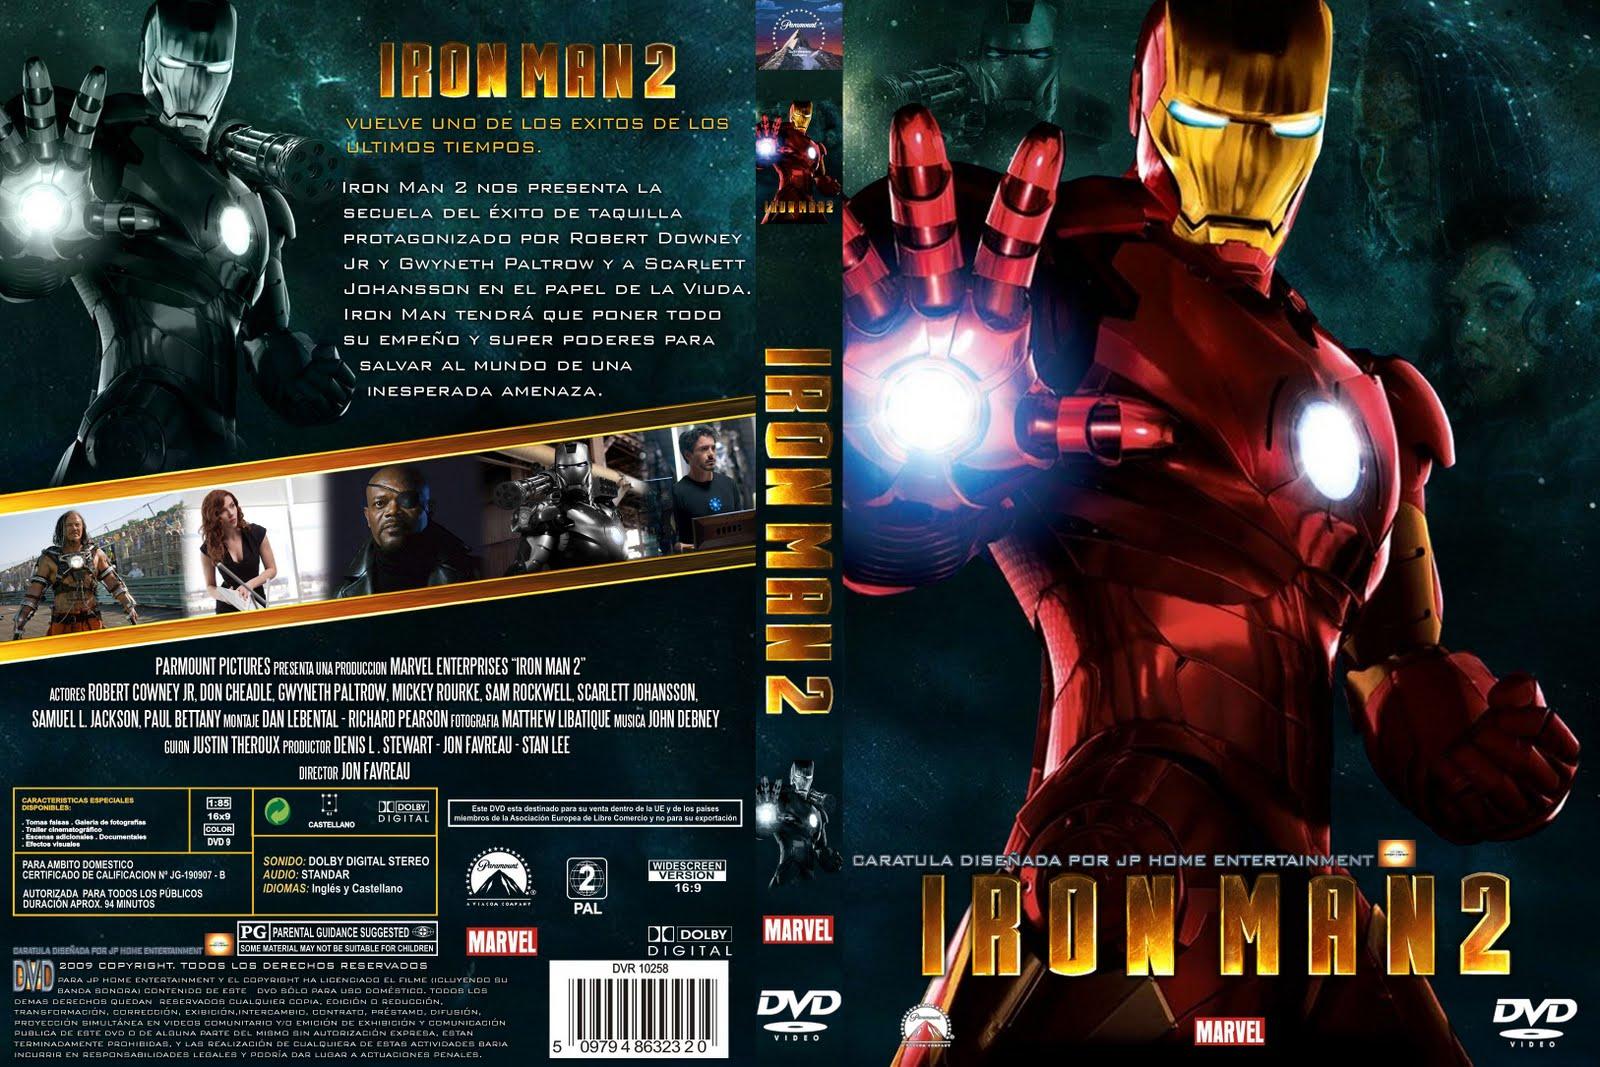 Iron man 2 dvd / Teresa rabal me pongo de pie